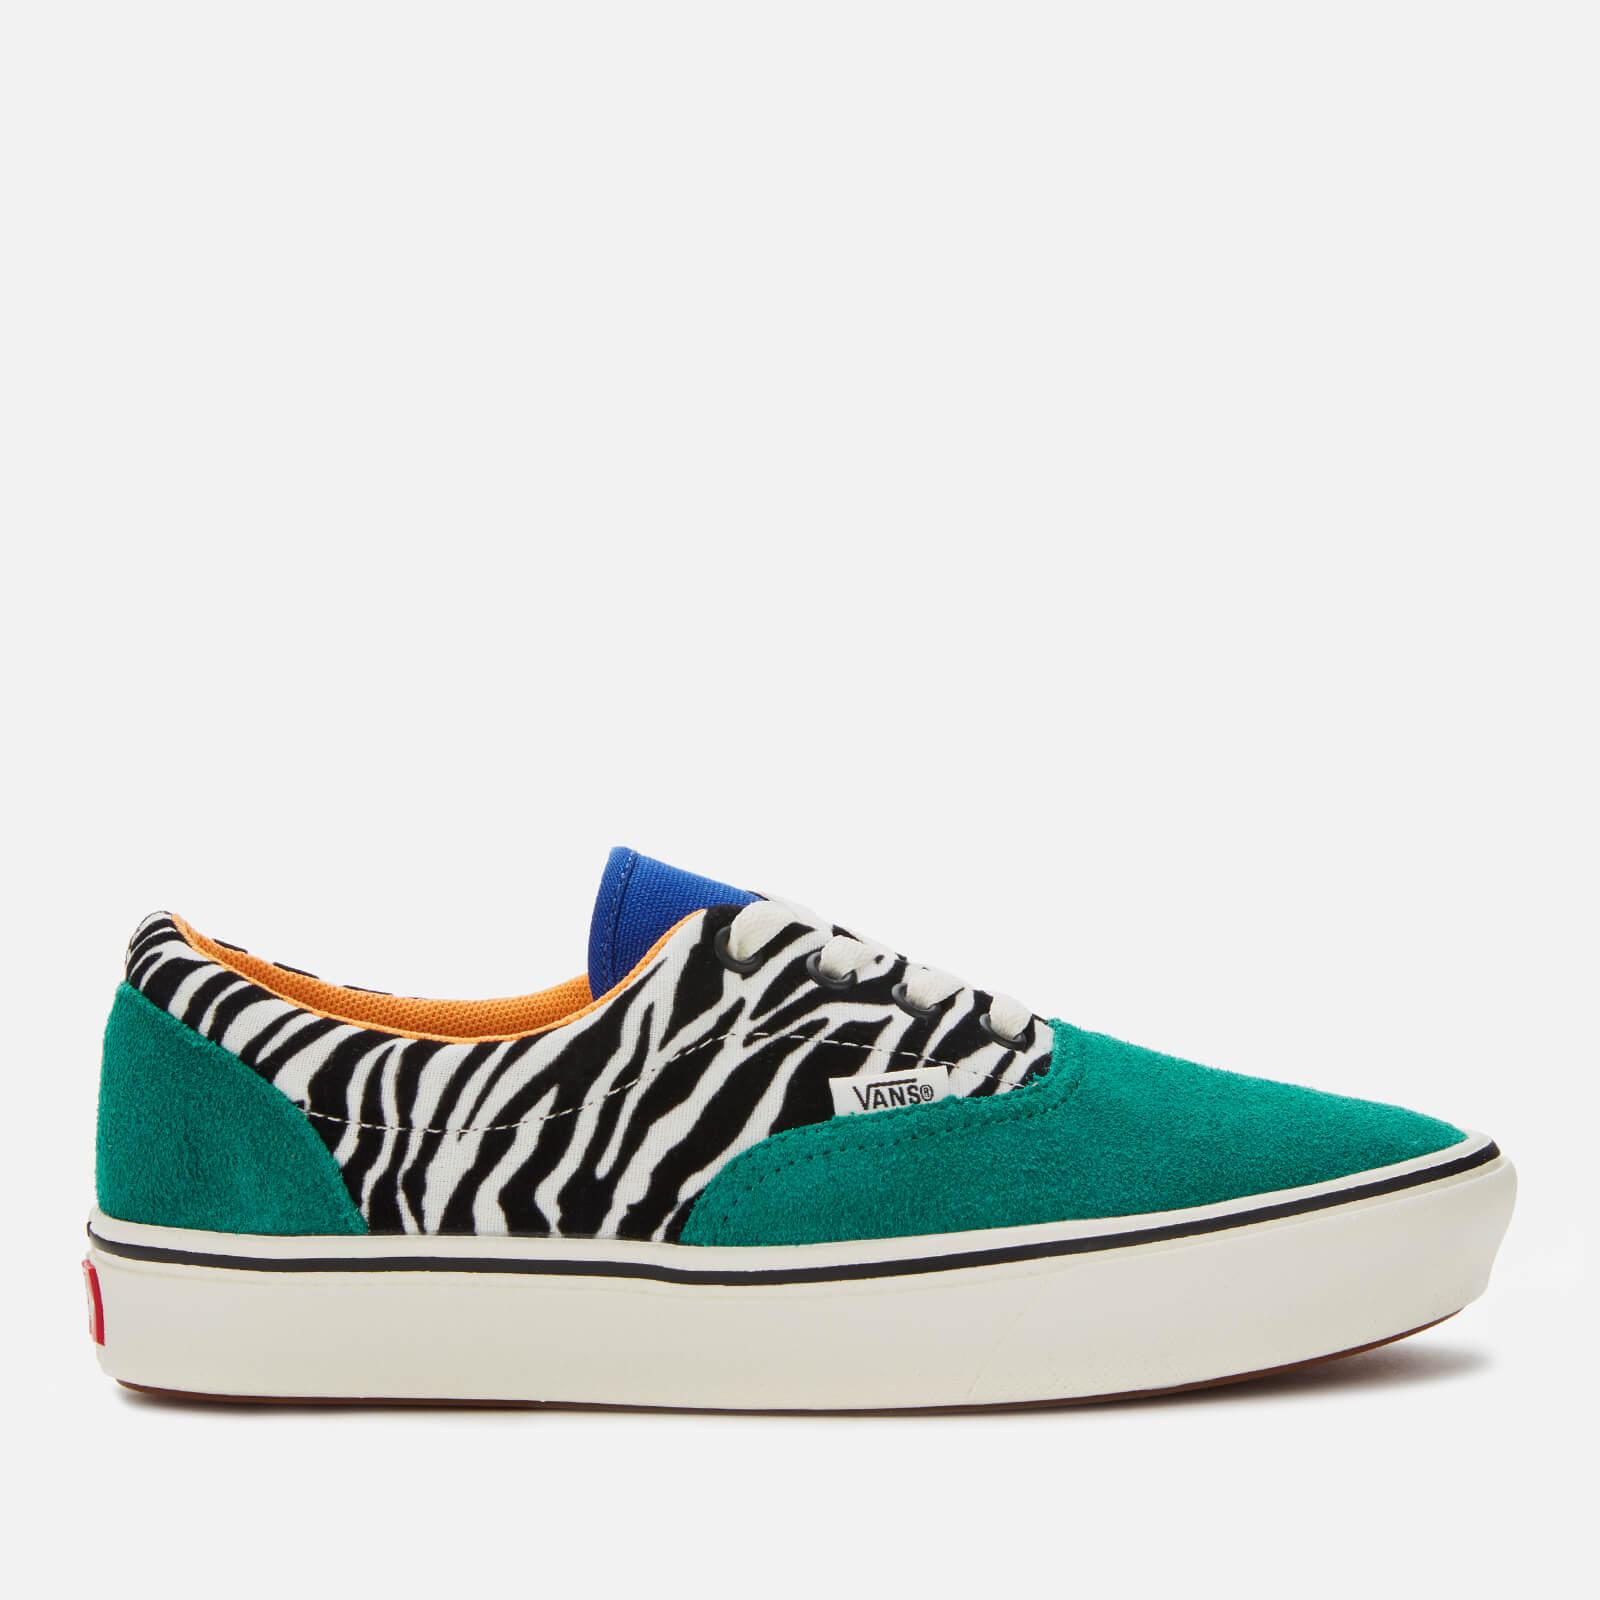 Vans ComfyCush Era Zebra Print Trainers - Tidepool/Surf The Web - UK 7 - Green/Multi